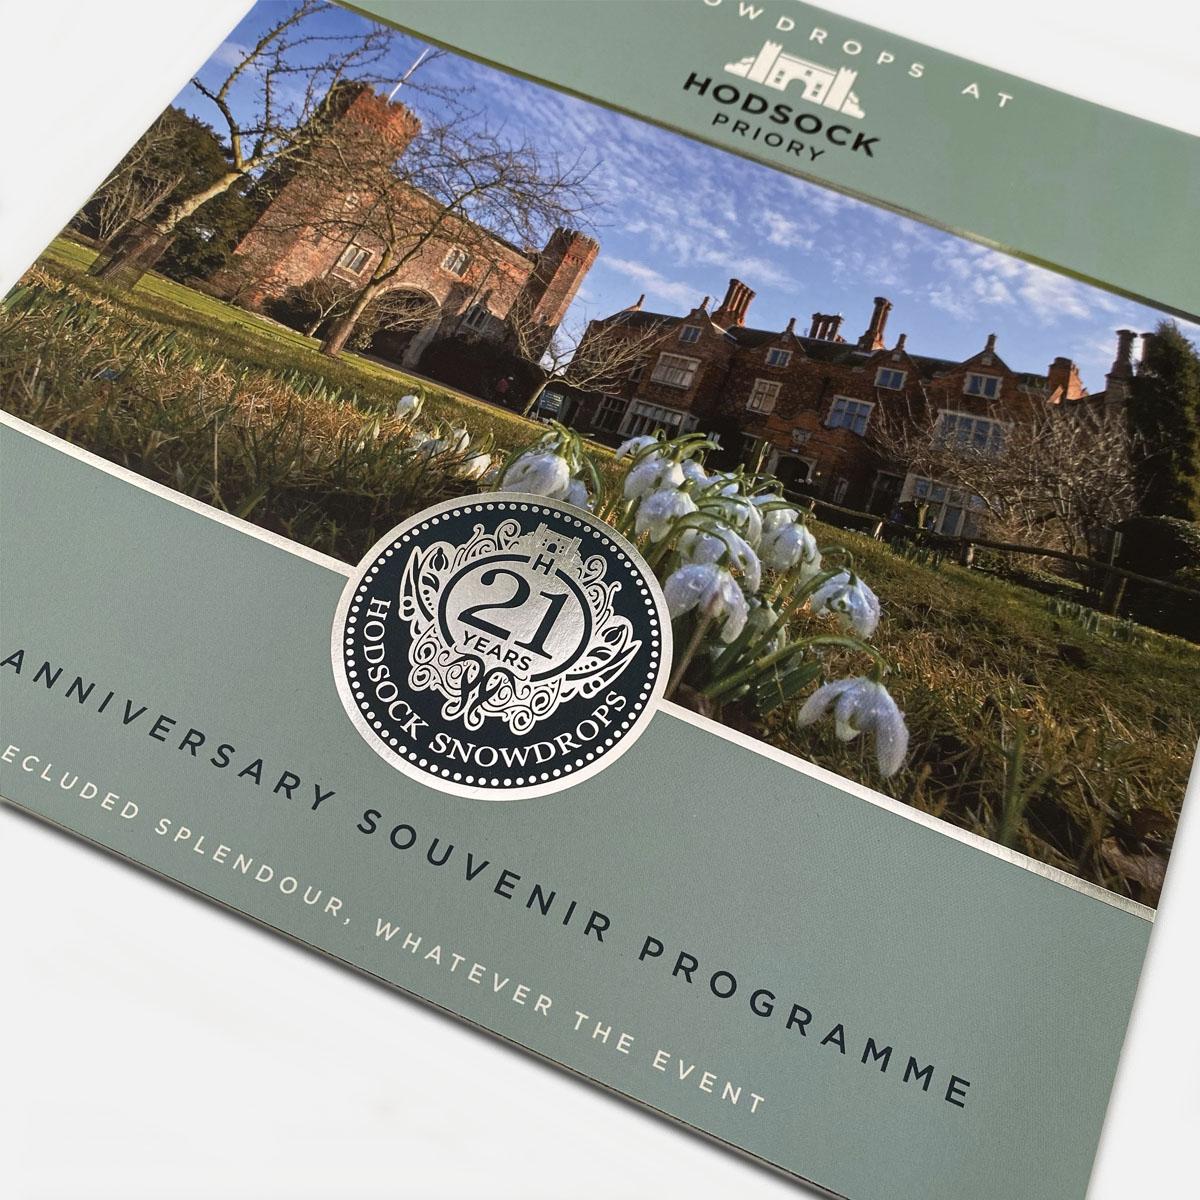 Hodsock Priory Snowdrops event 21st Anniversary souvenir